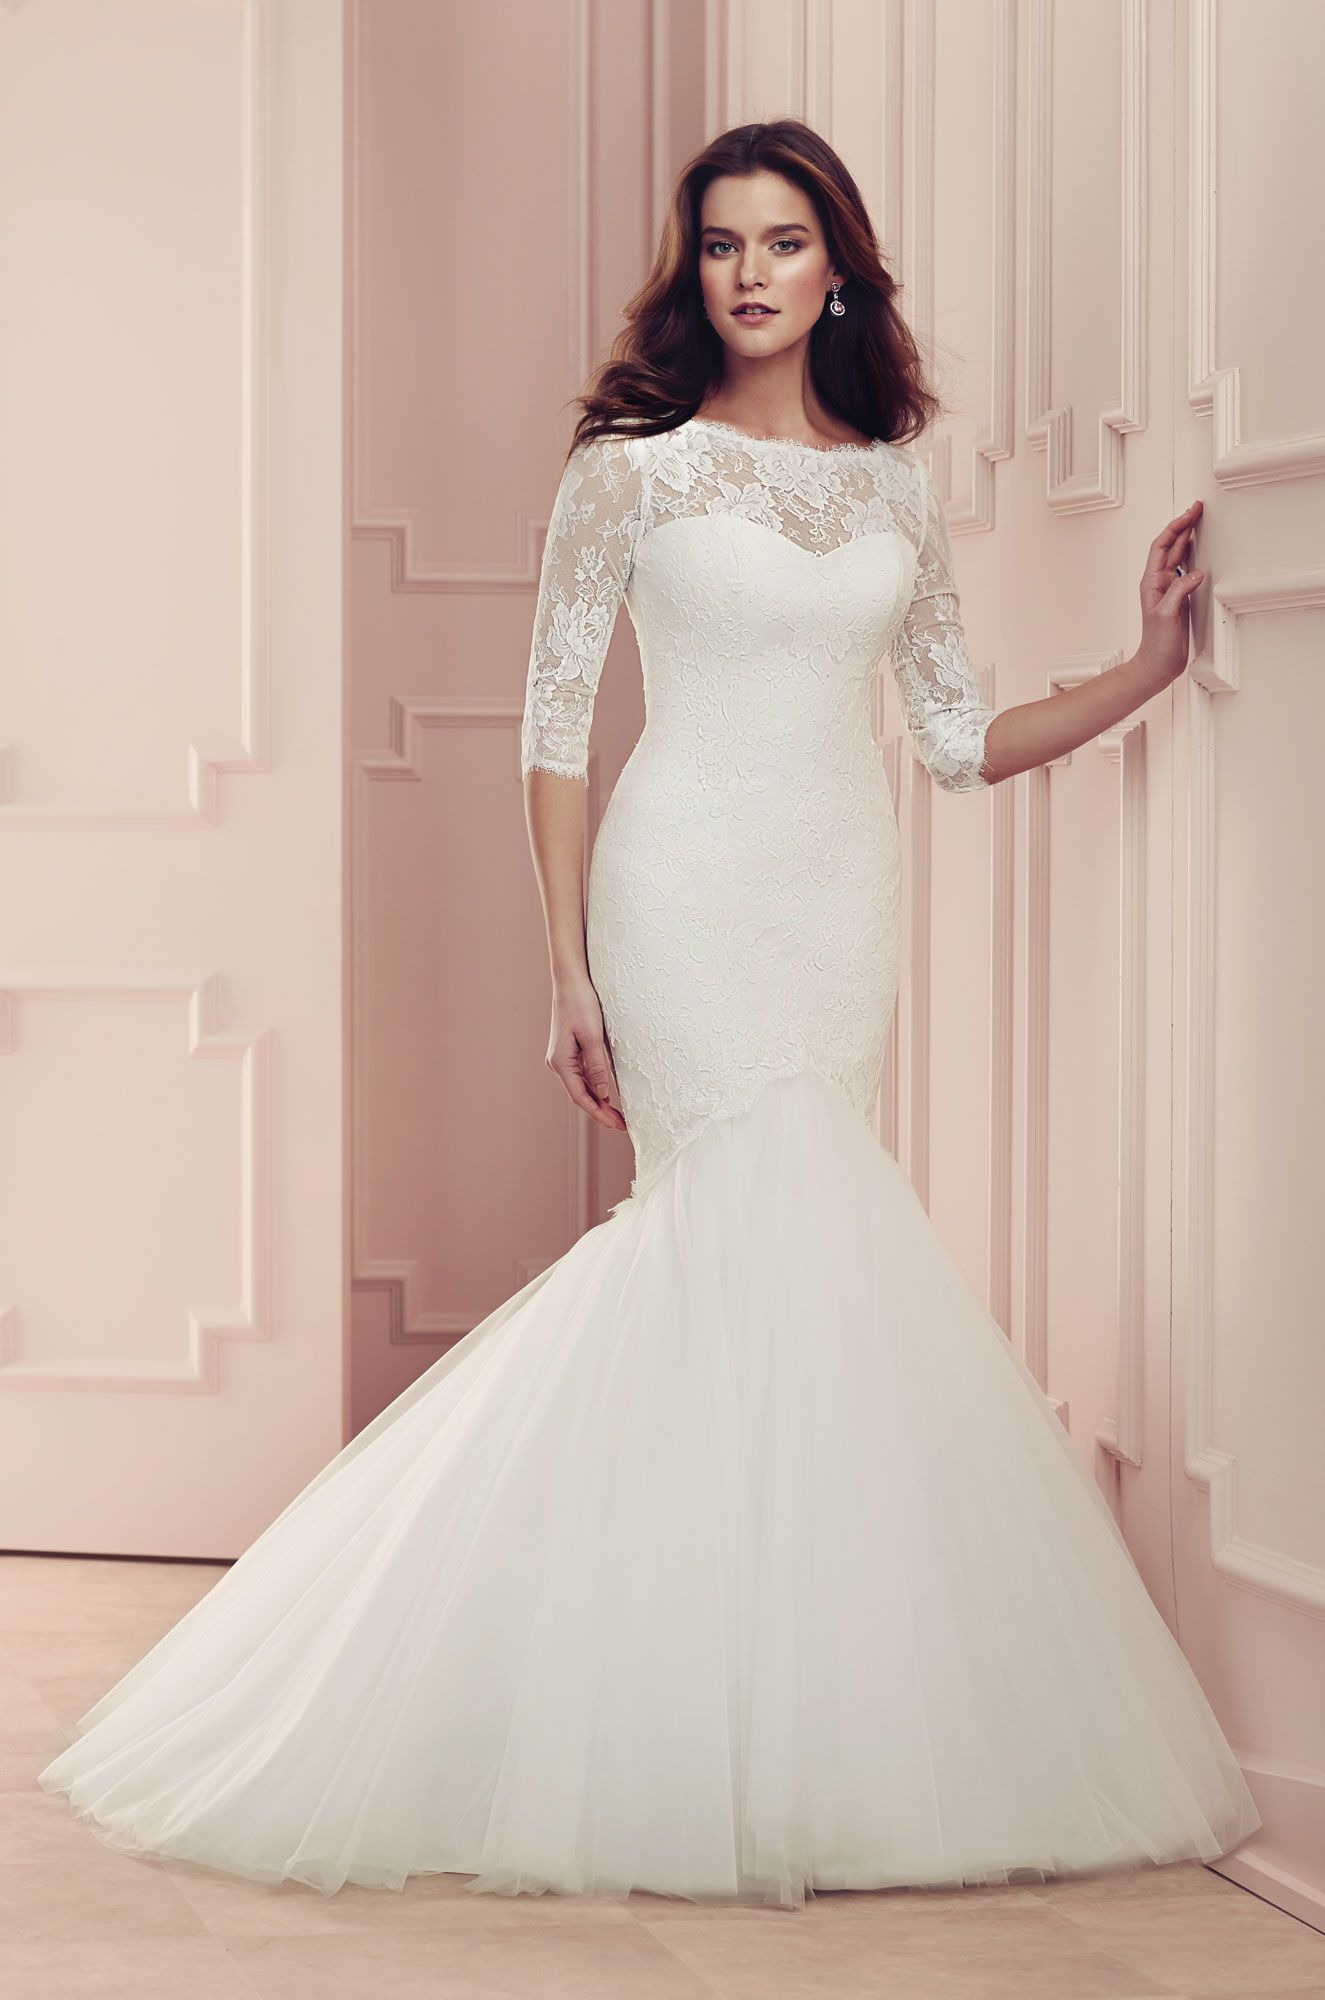 Paloma blanca bridal modest bridal dresses pinterest paloma